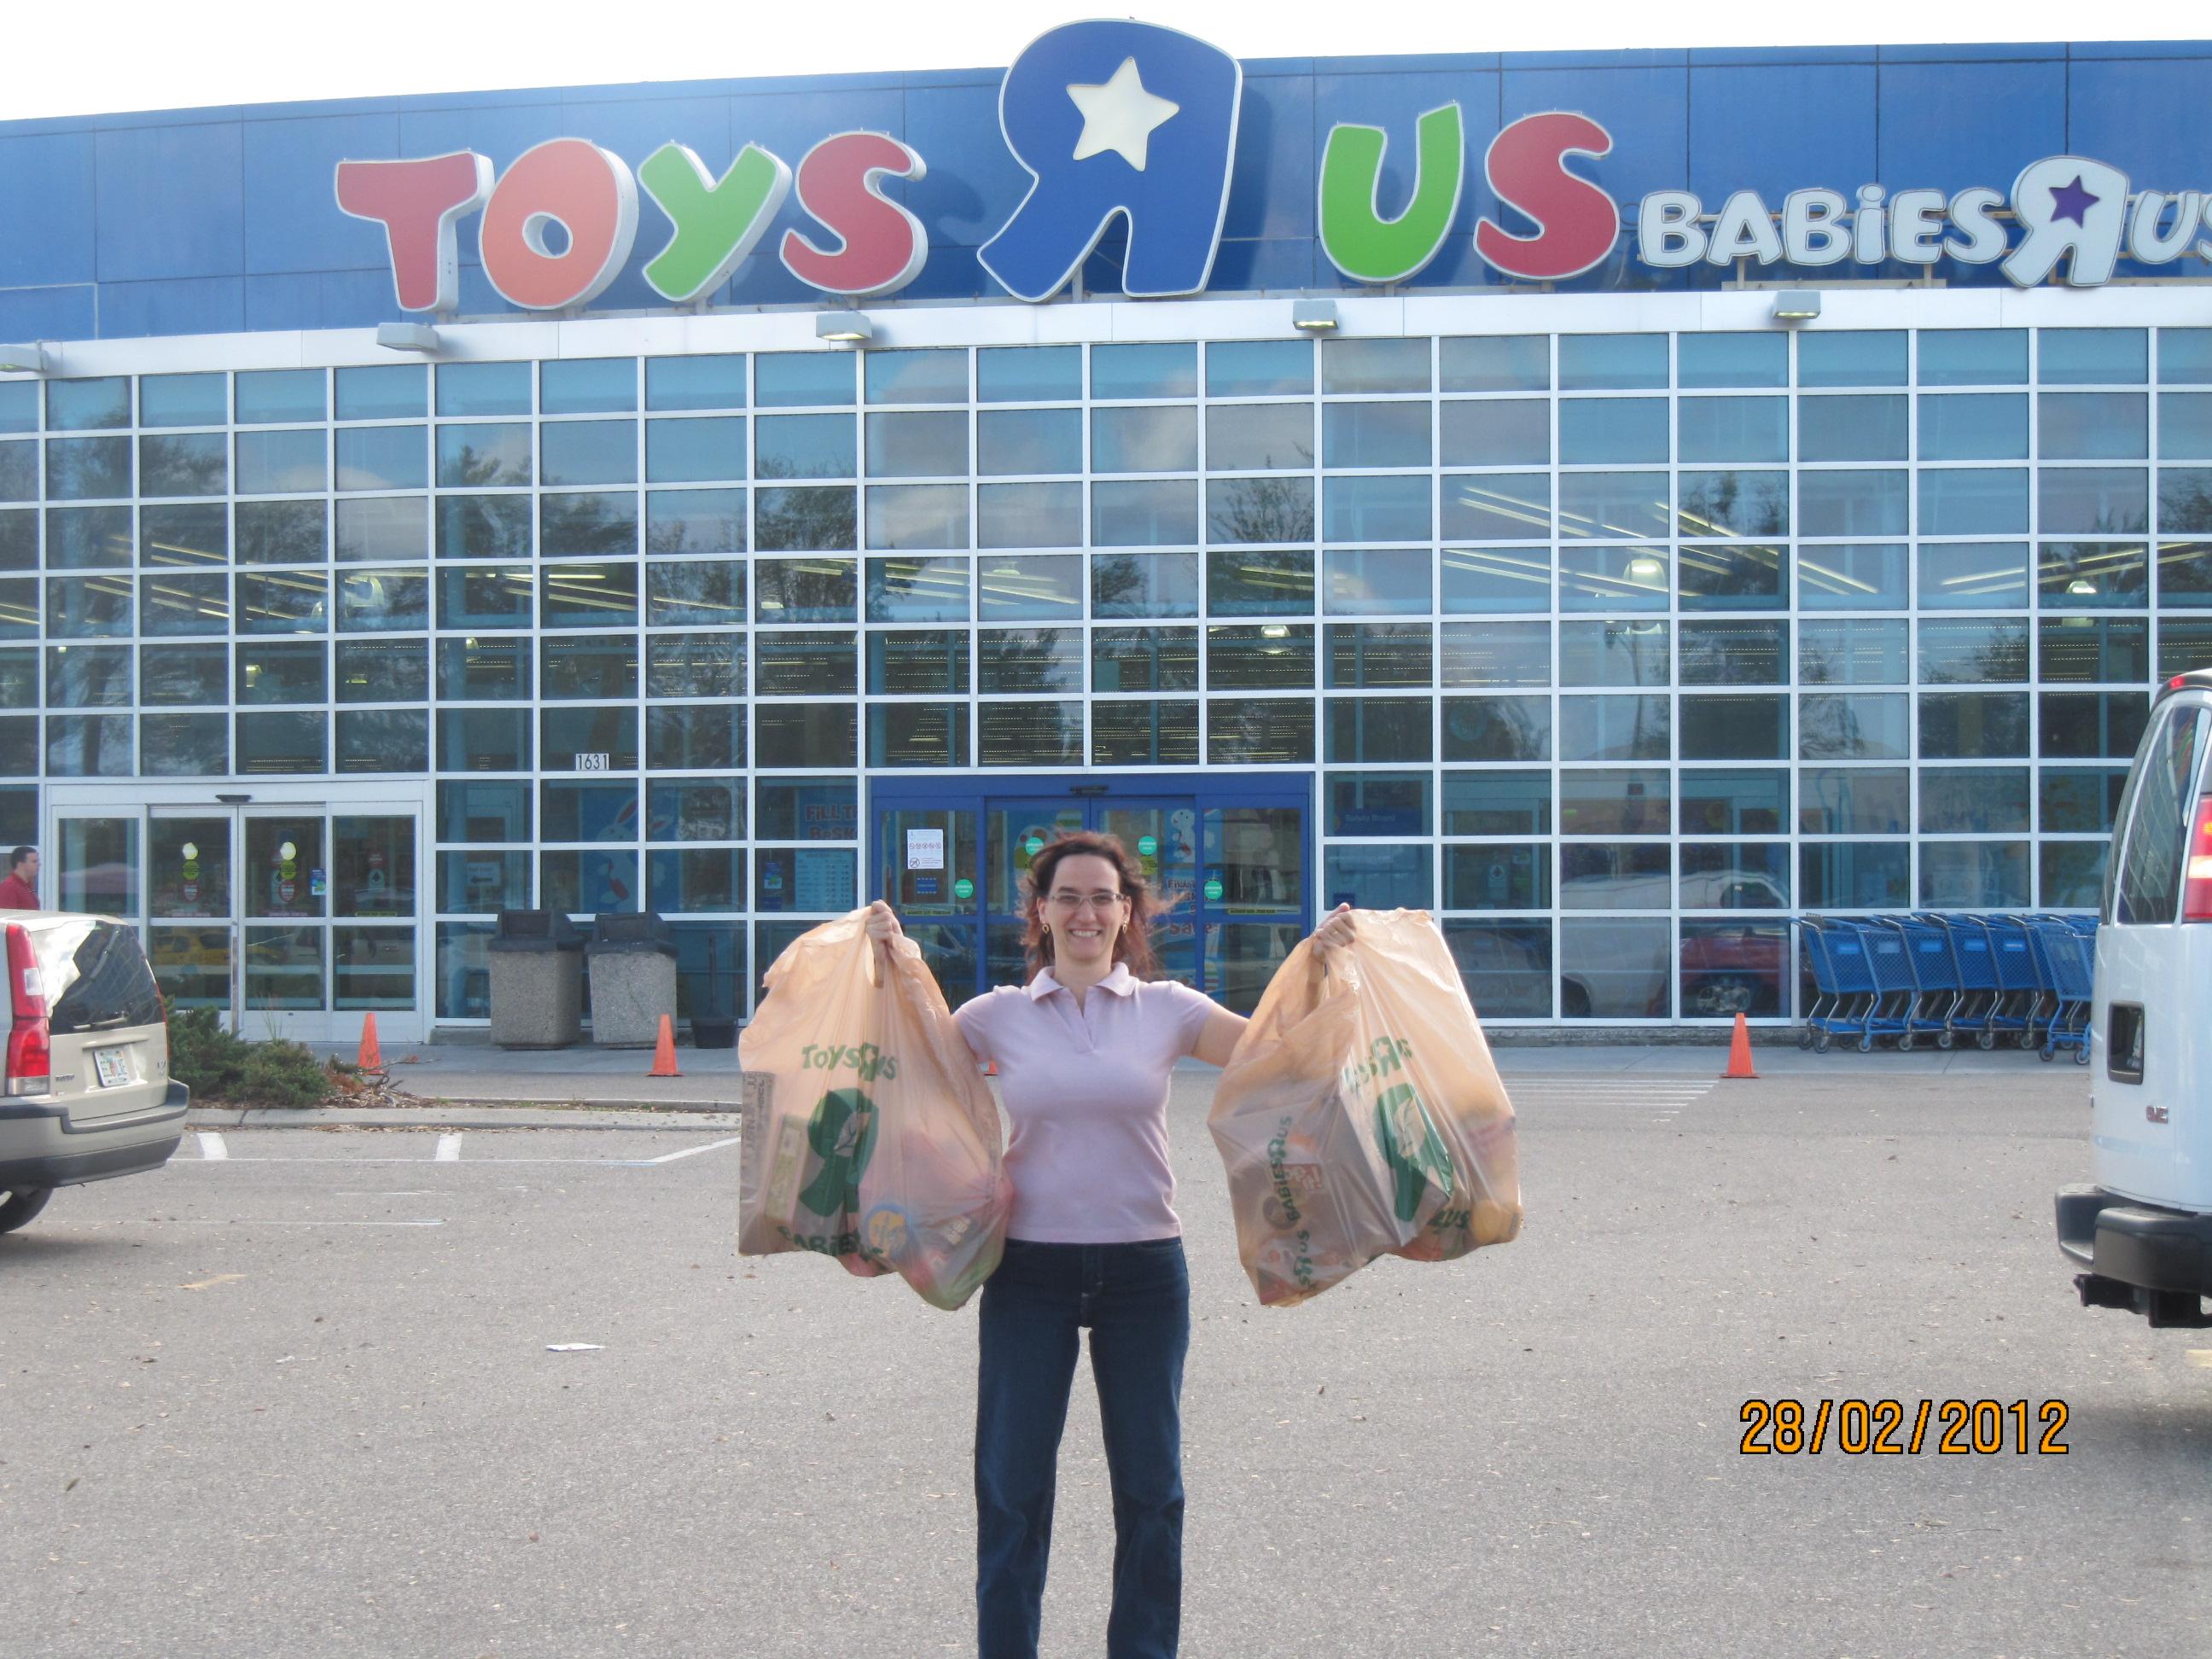 Toys R Us - o paraíso dos brinquedos!